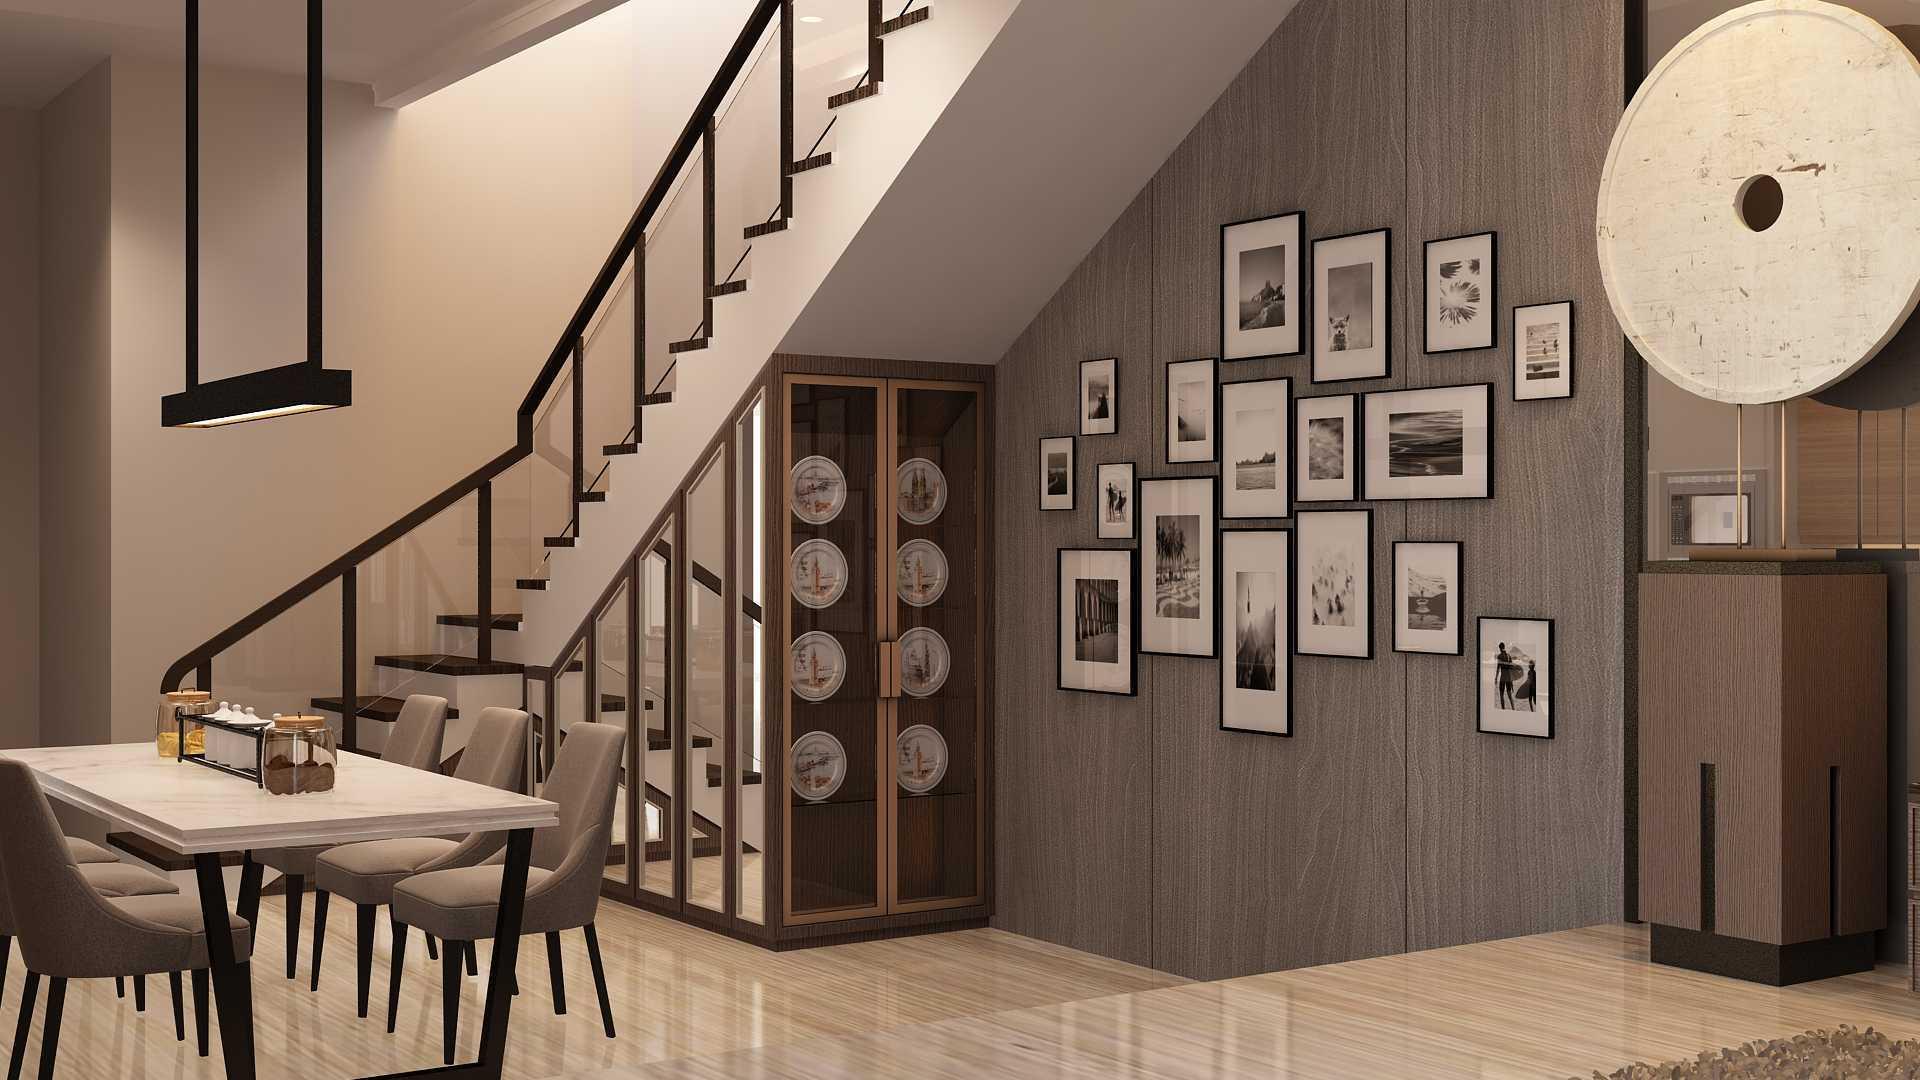 Simplifica Interior Contemporary House Surabaya, Kota Sby, Jawa Timur, Indonesia Surabaya, Kota Sby, Jawa Timur, Indonesia Simplifica-Interior-Contemporary-House   62974